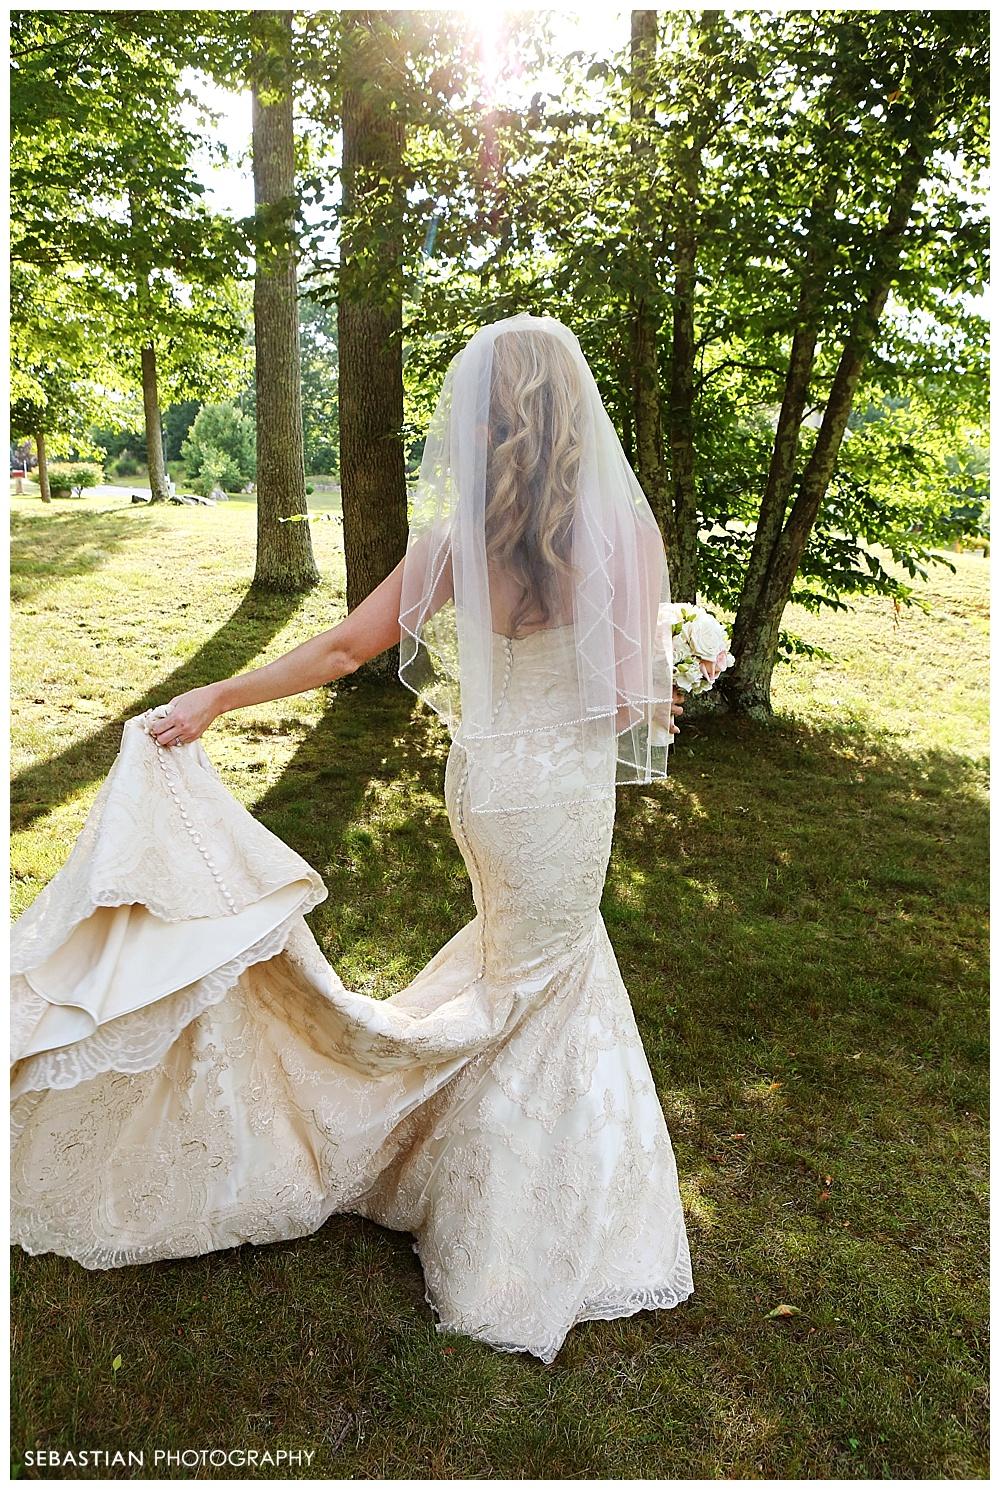 CT Wedding Photographer_Sebastian Photography_Lake of Isles_Outdoor Wedding_Murray_Bransford1011.jpg